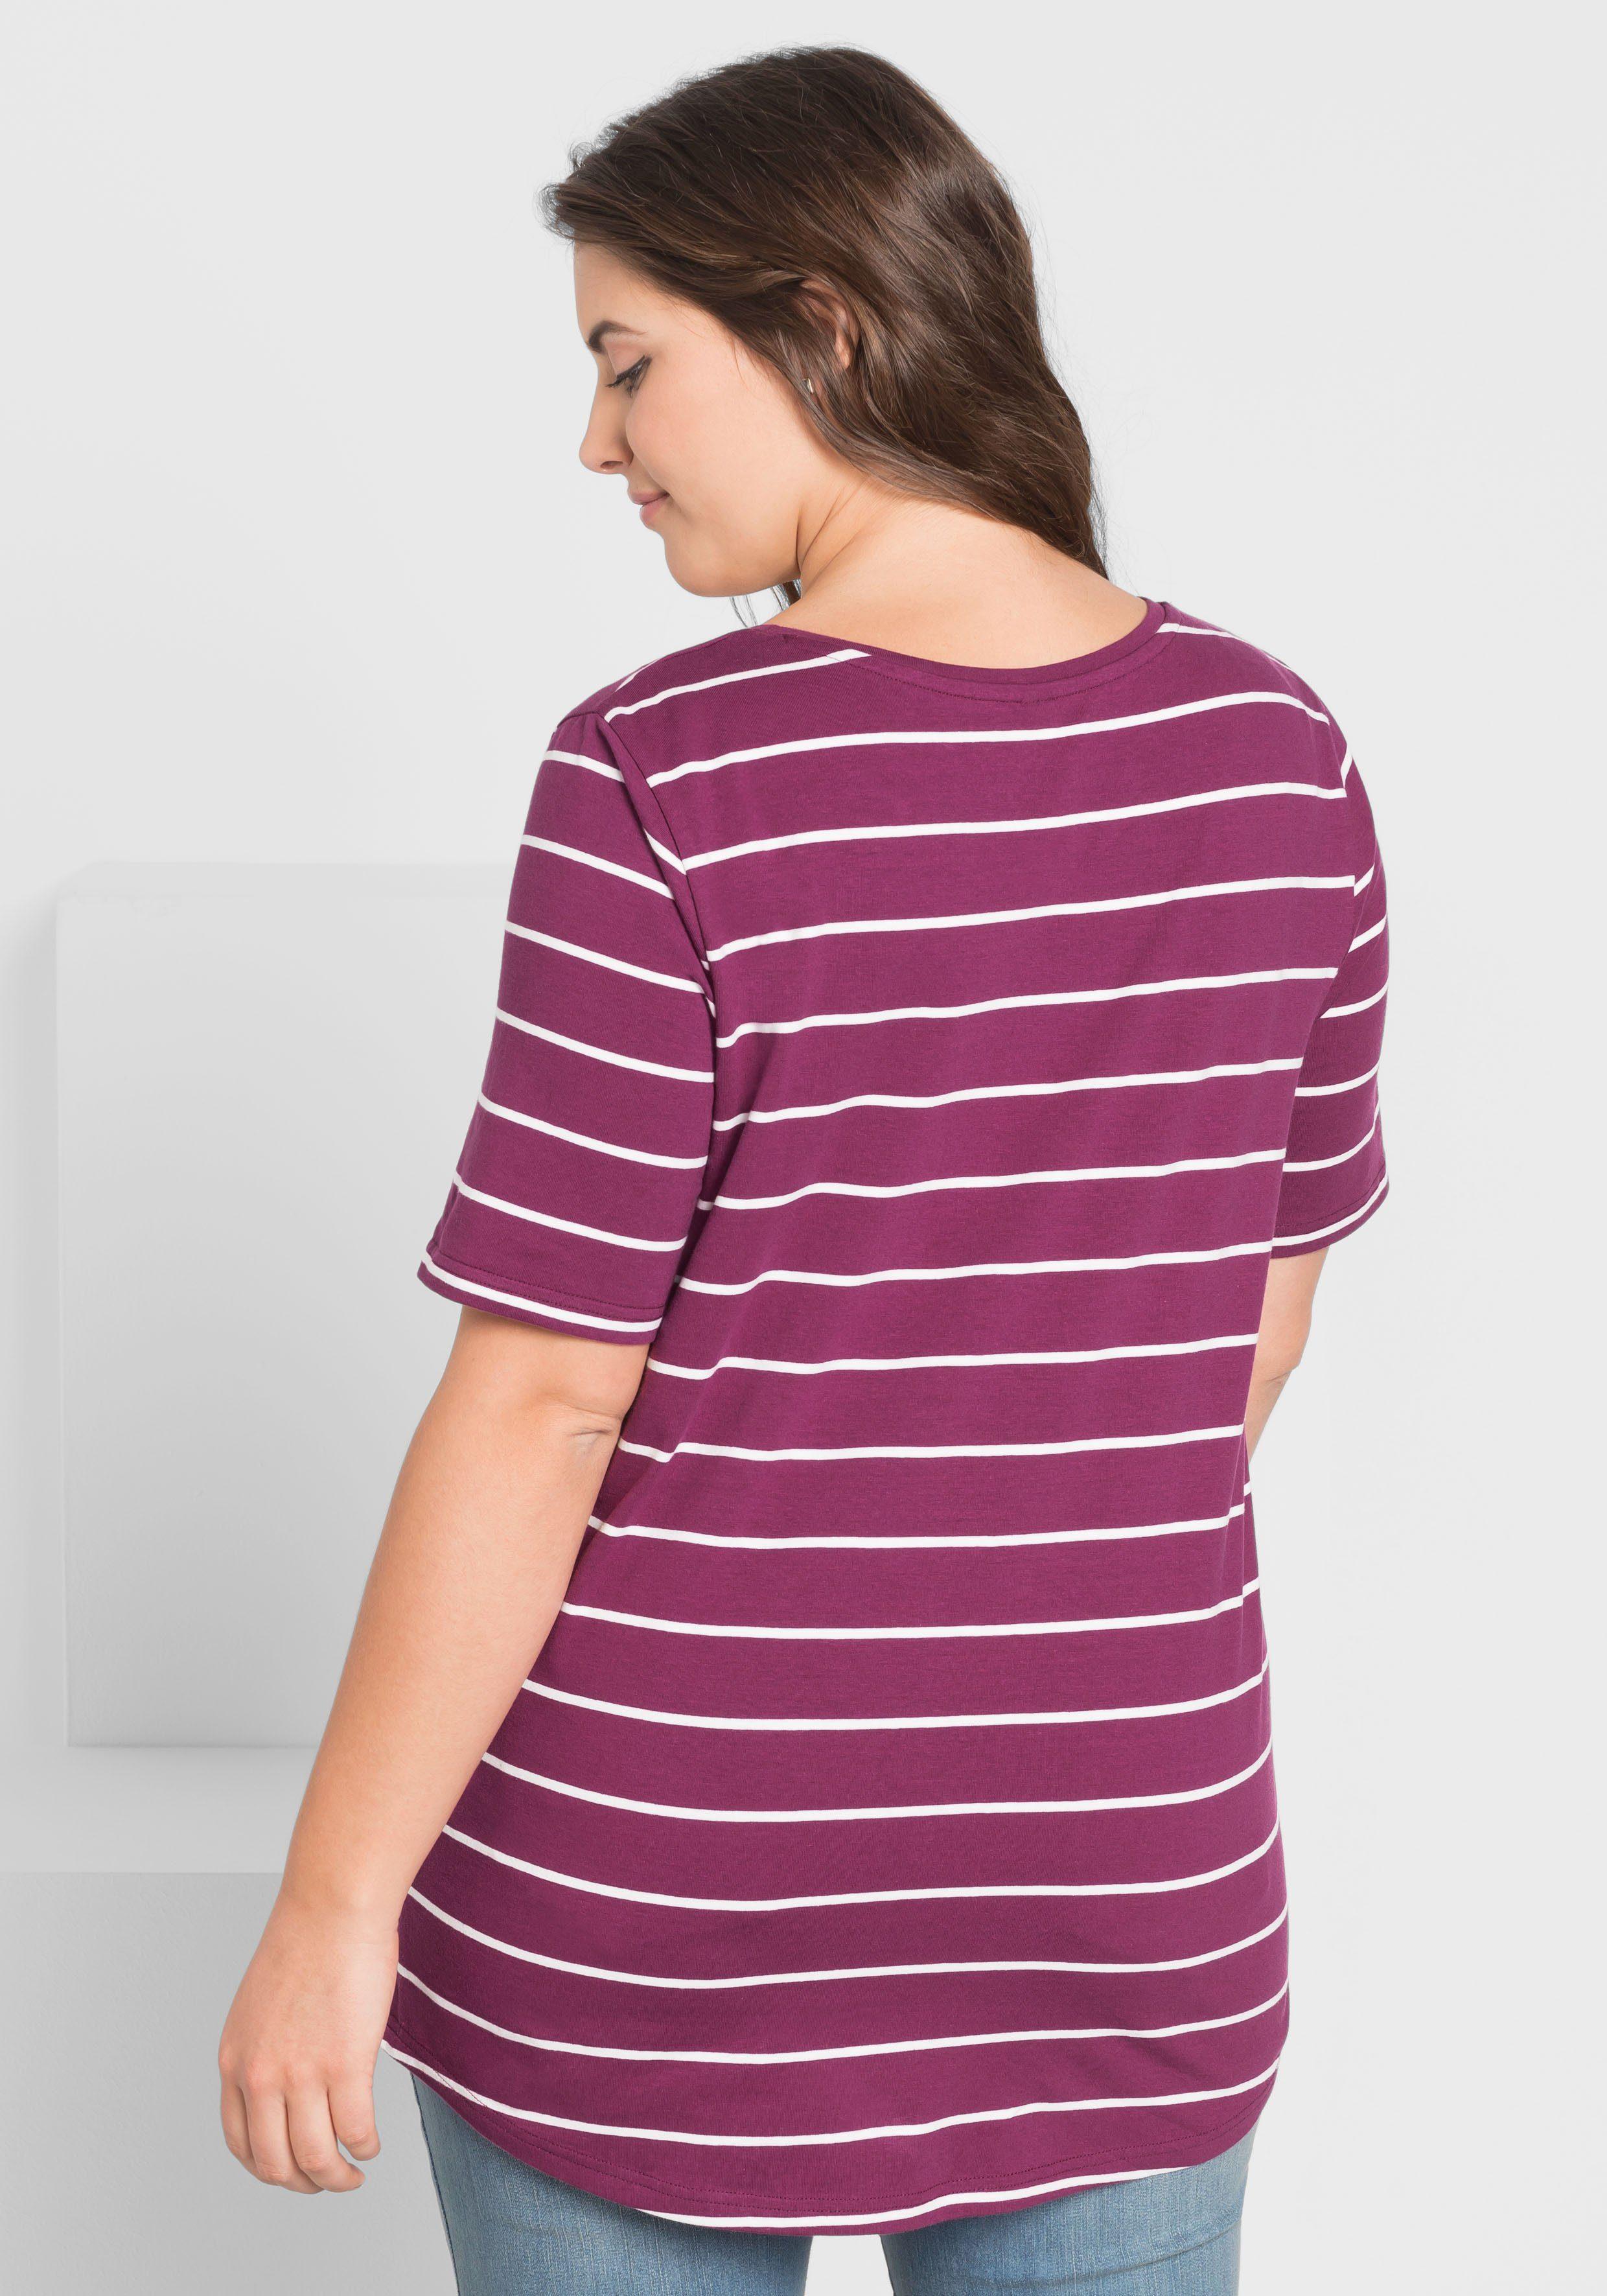 Online Kaufen Basic T shirtMit Längerem Sheego Halbarm EeD2HIW9Y